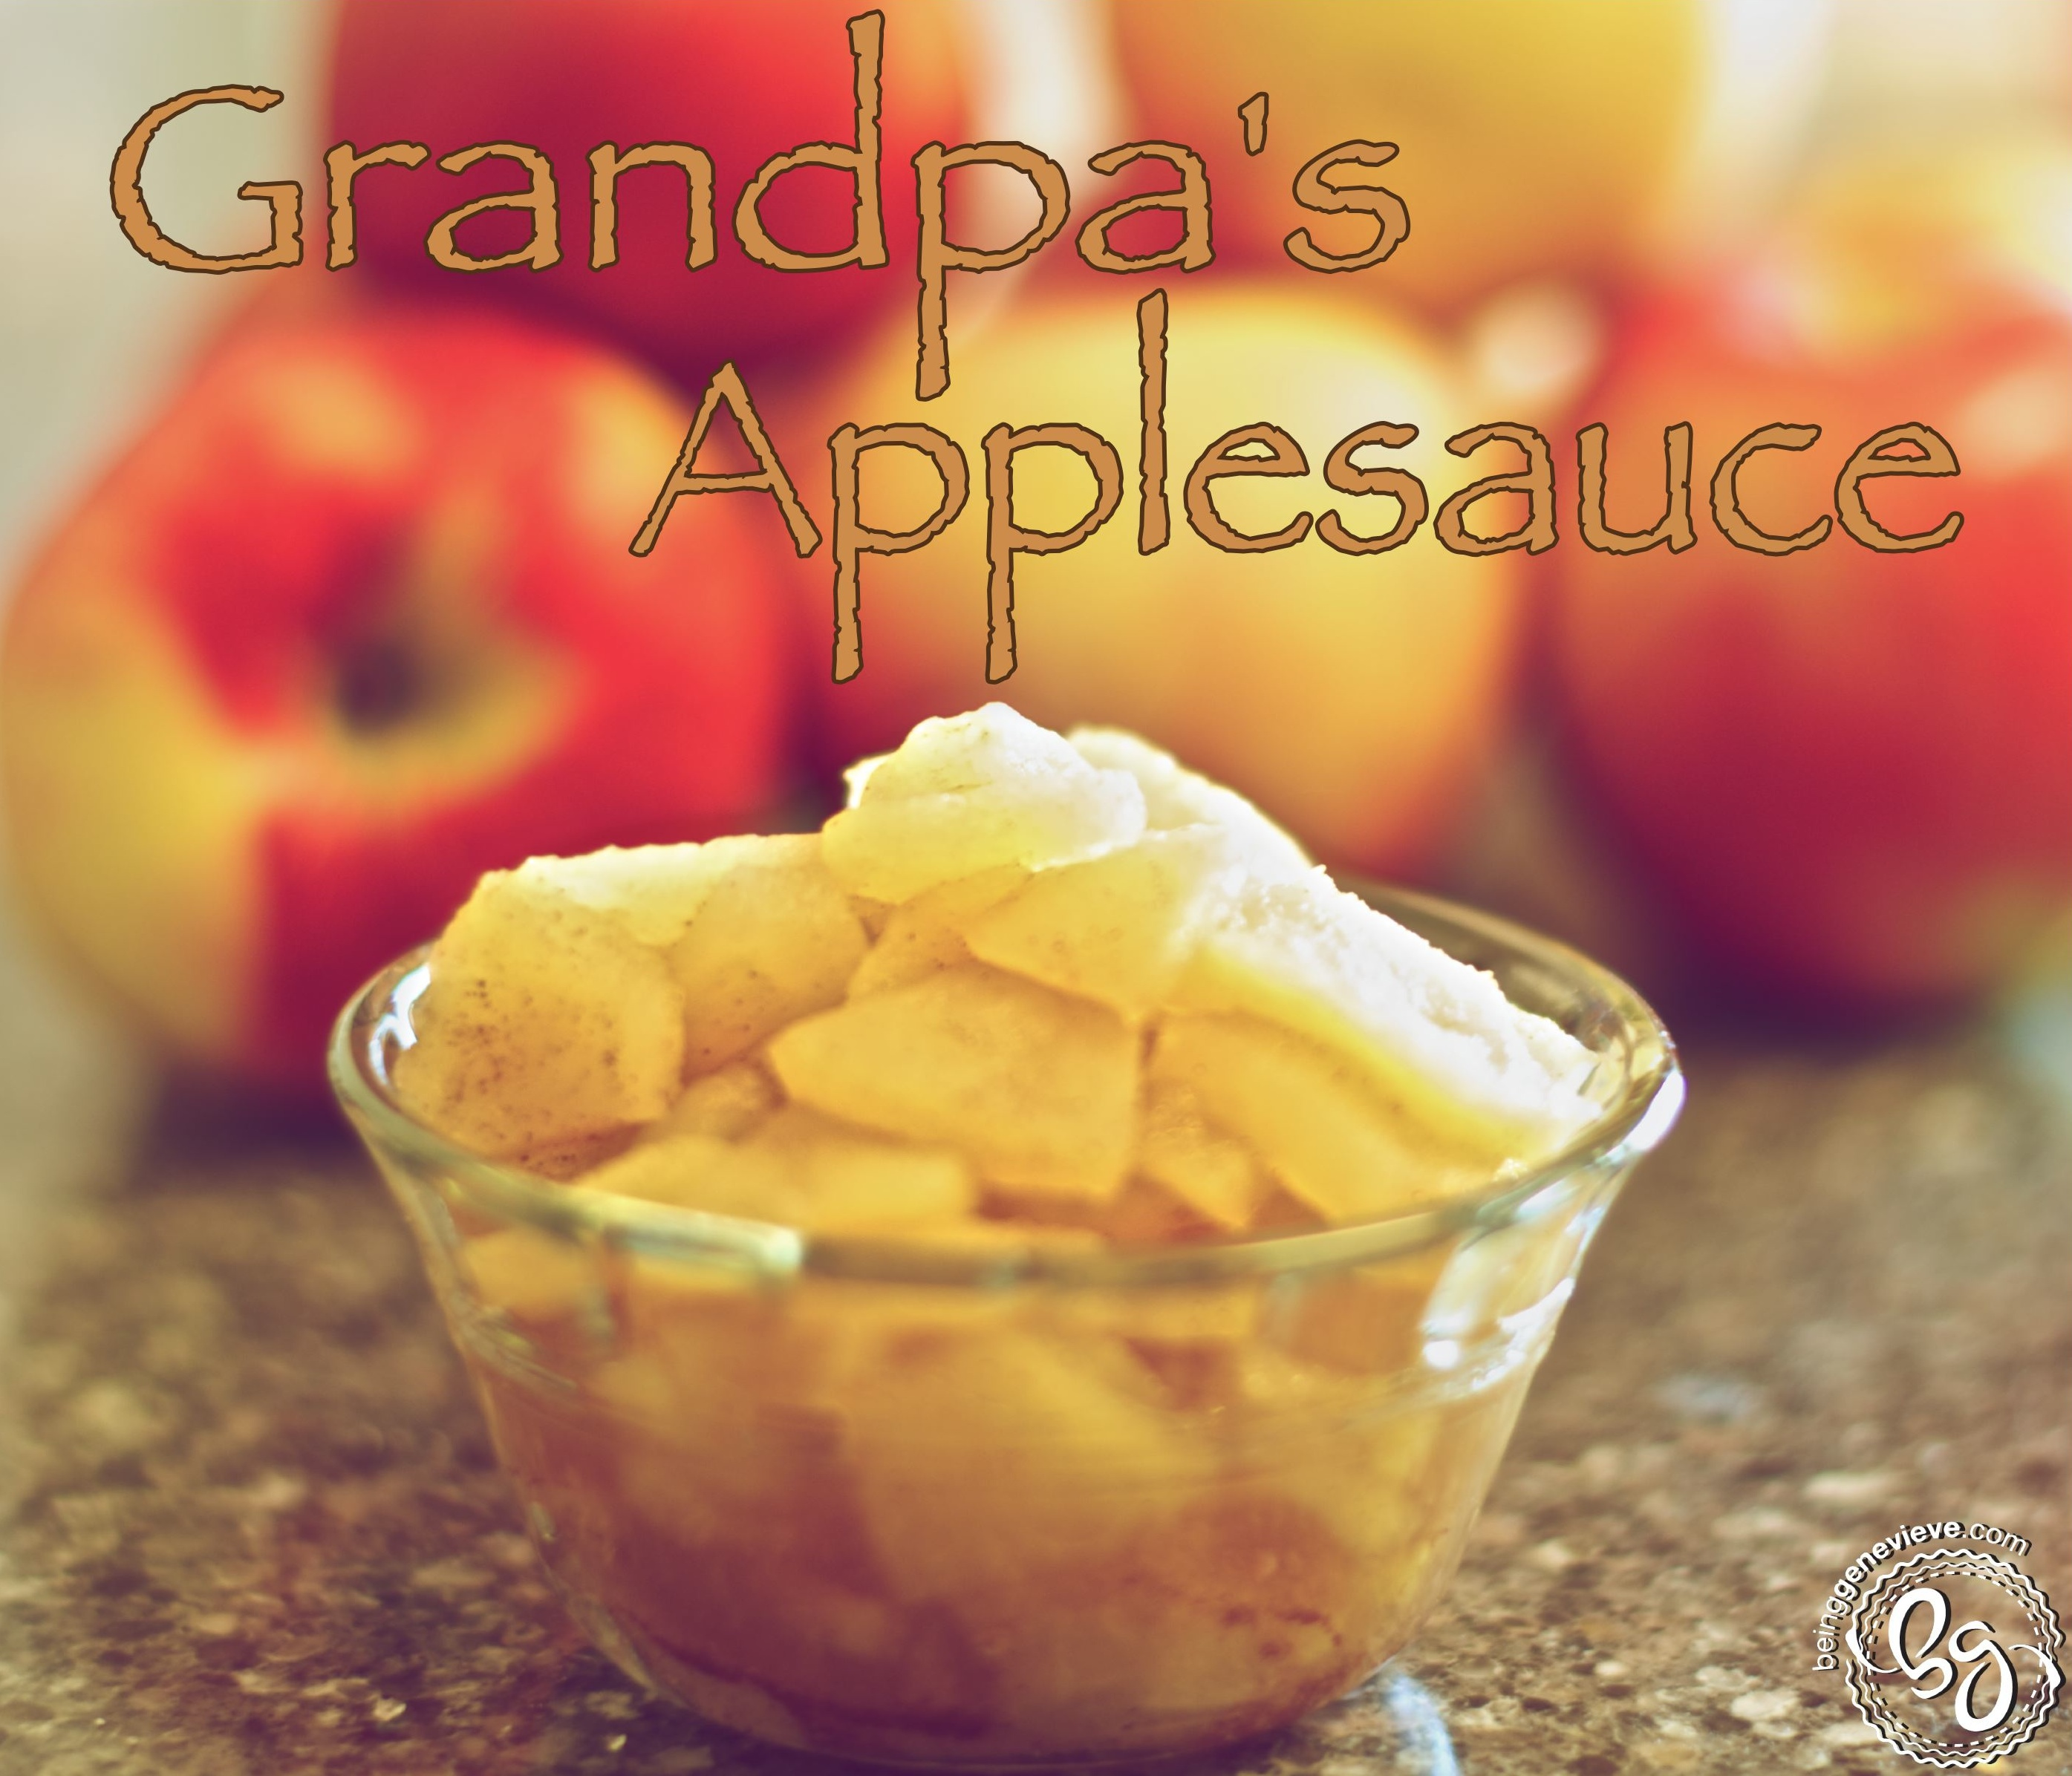 Grandpa's Applesauce